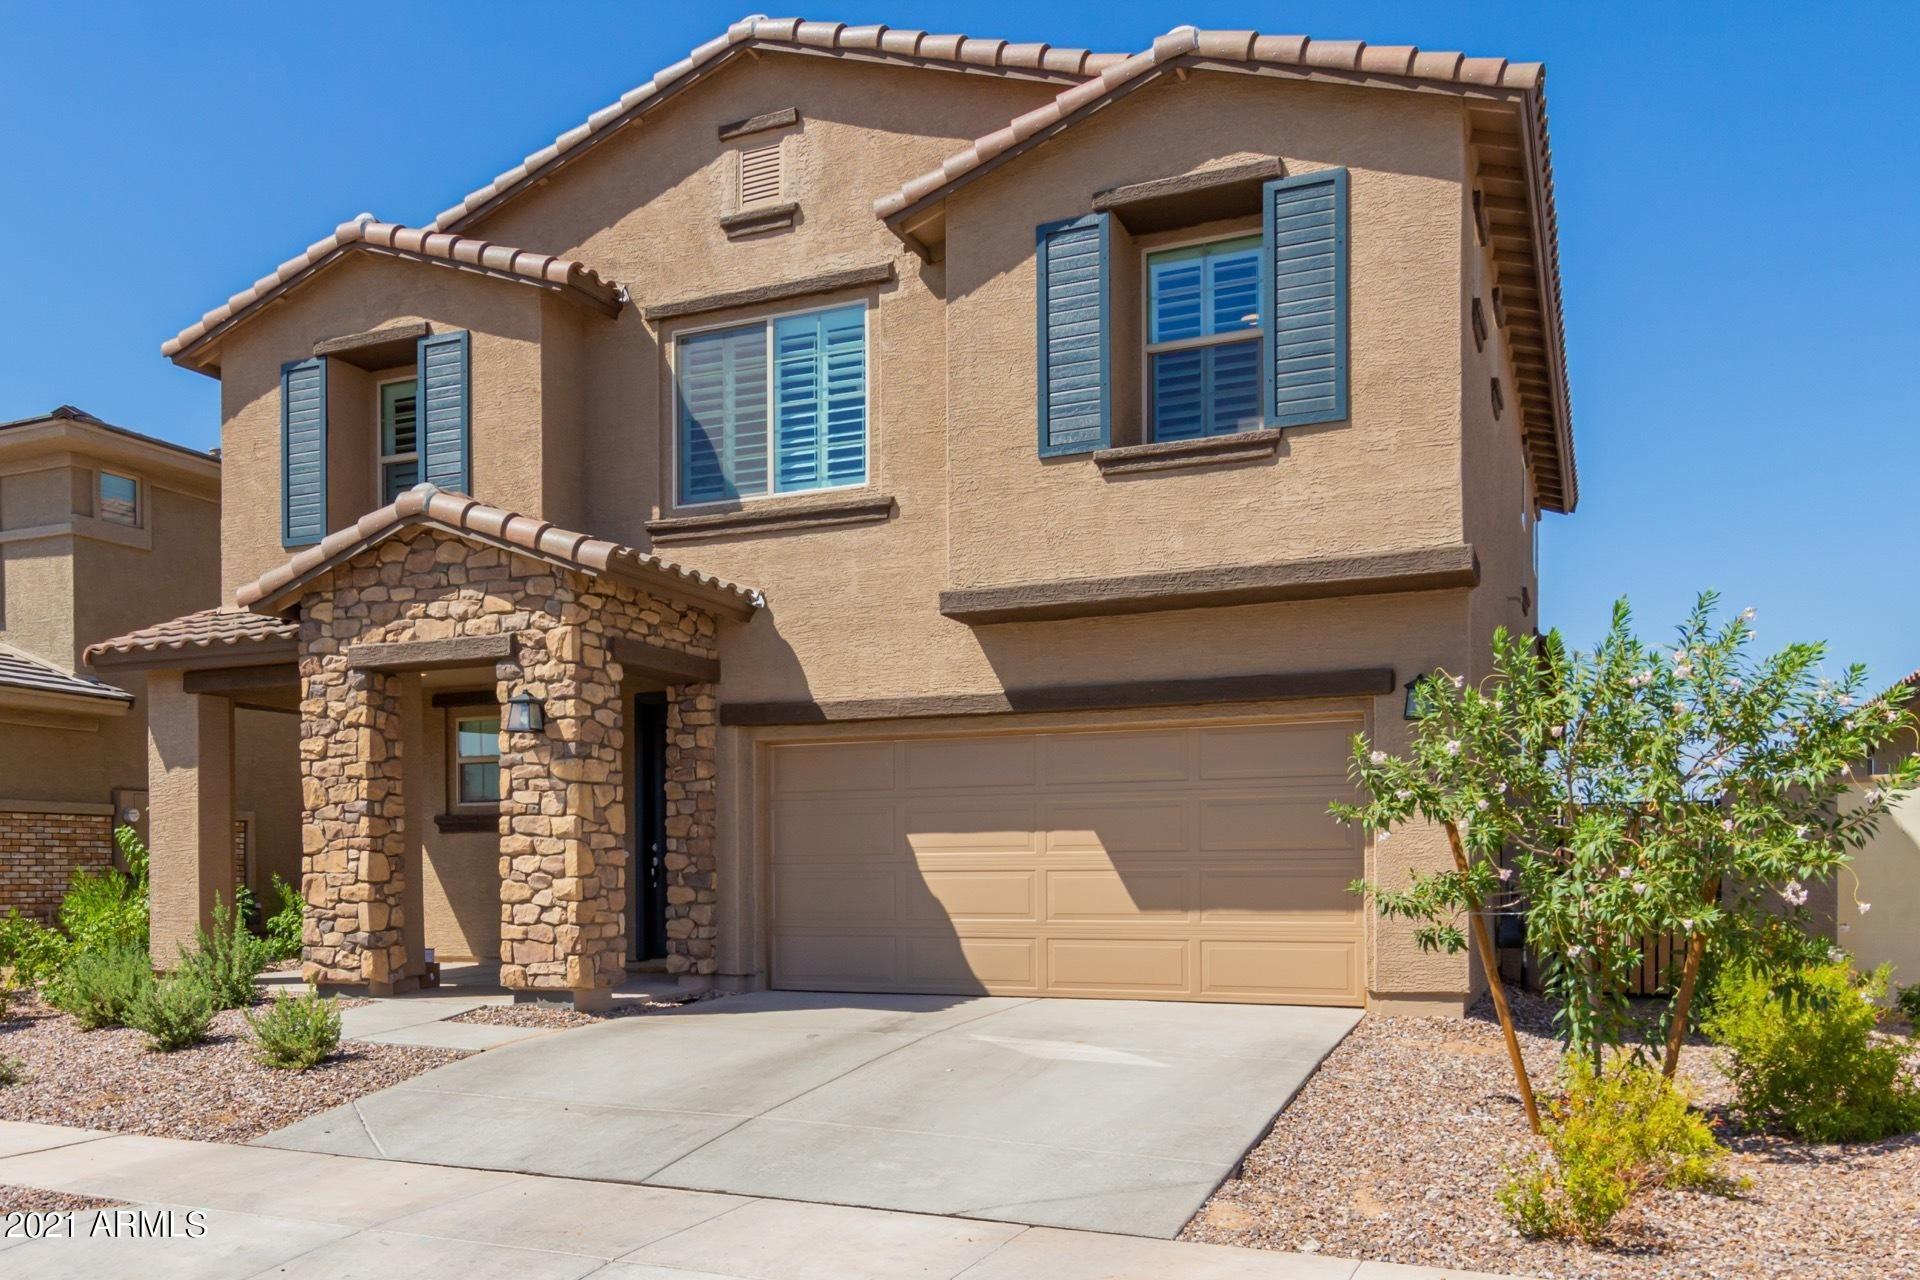 Photo of 14656 W DAHLIA Drive, Surprise, AZ 85379 (MLS # 6200880)